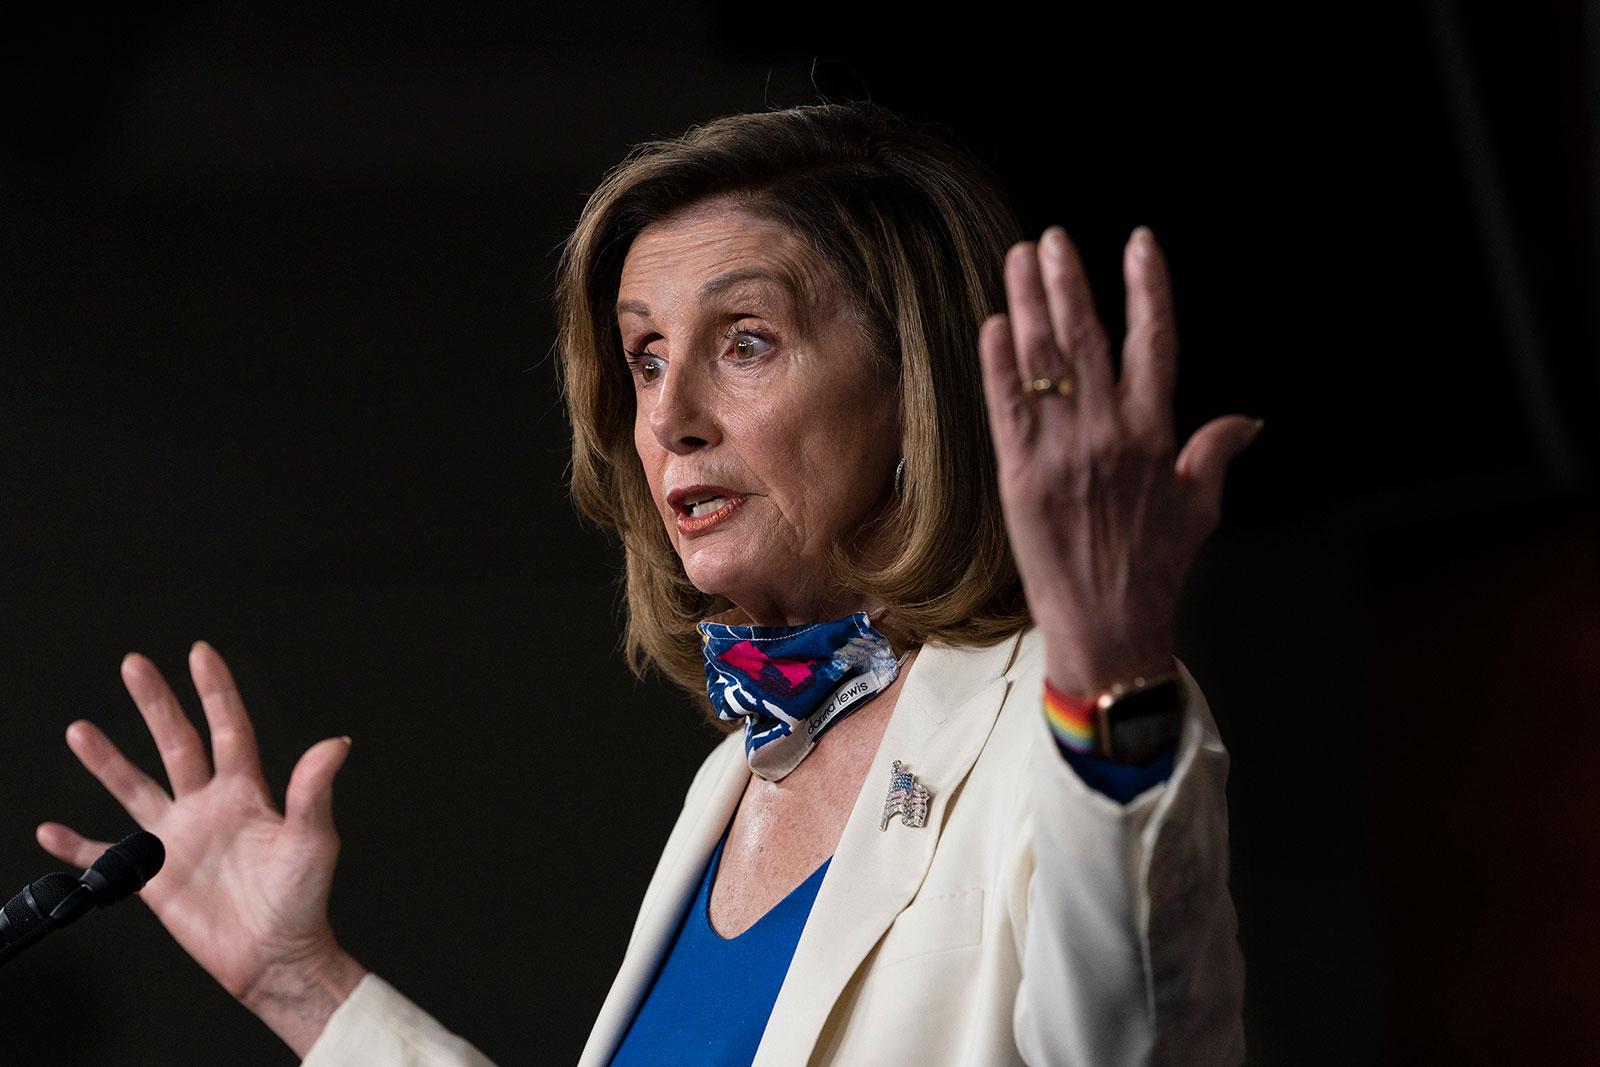 House Speaker Nancy Pelosi speaks during a news conference on Thursday, October 1.